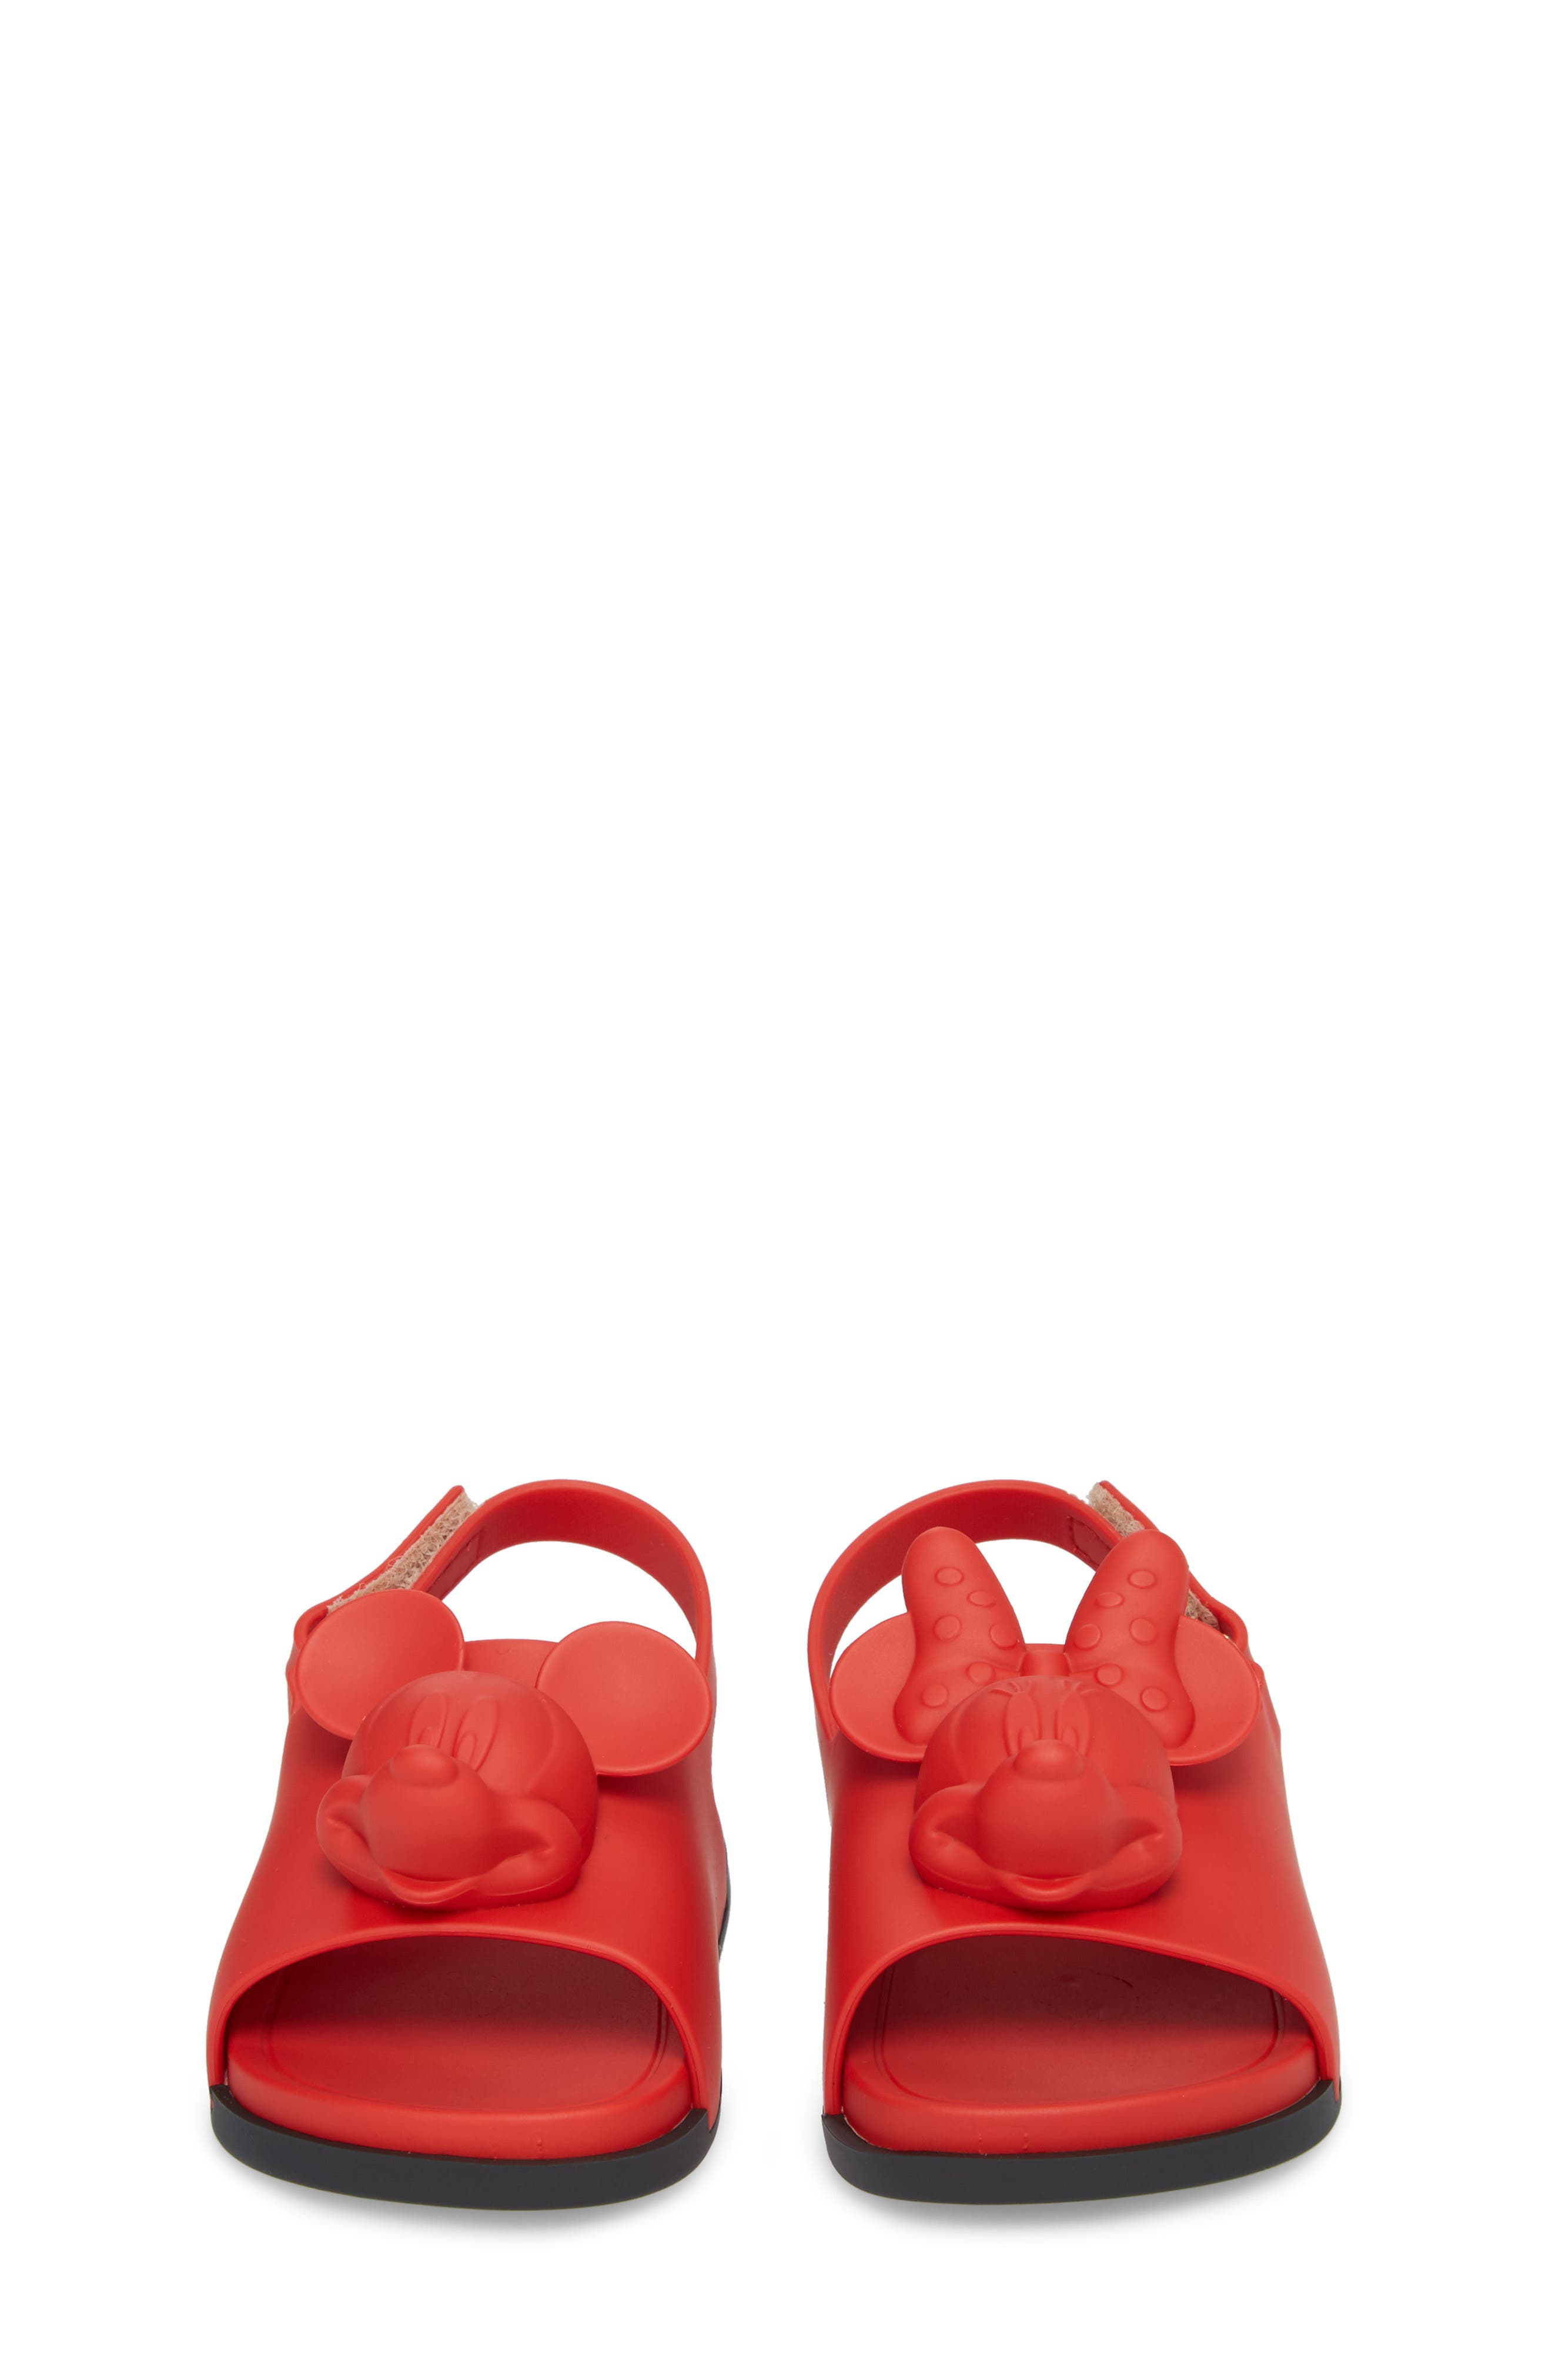 Disney<sup>®</sup> Mini Beach Sandal,                             Alternate thumbnail 19, color,